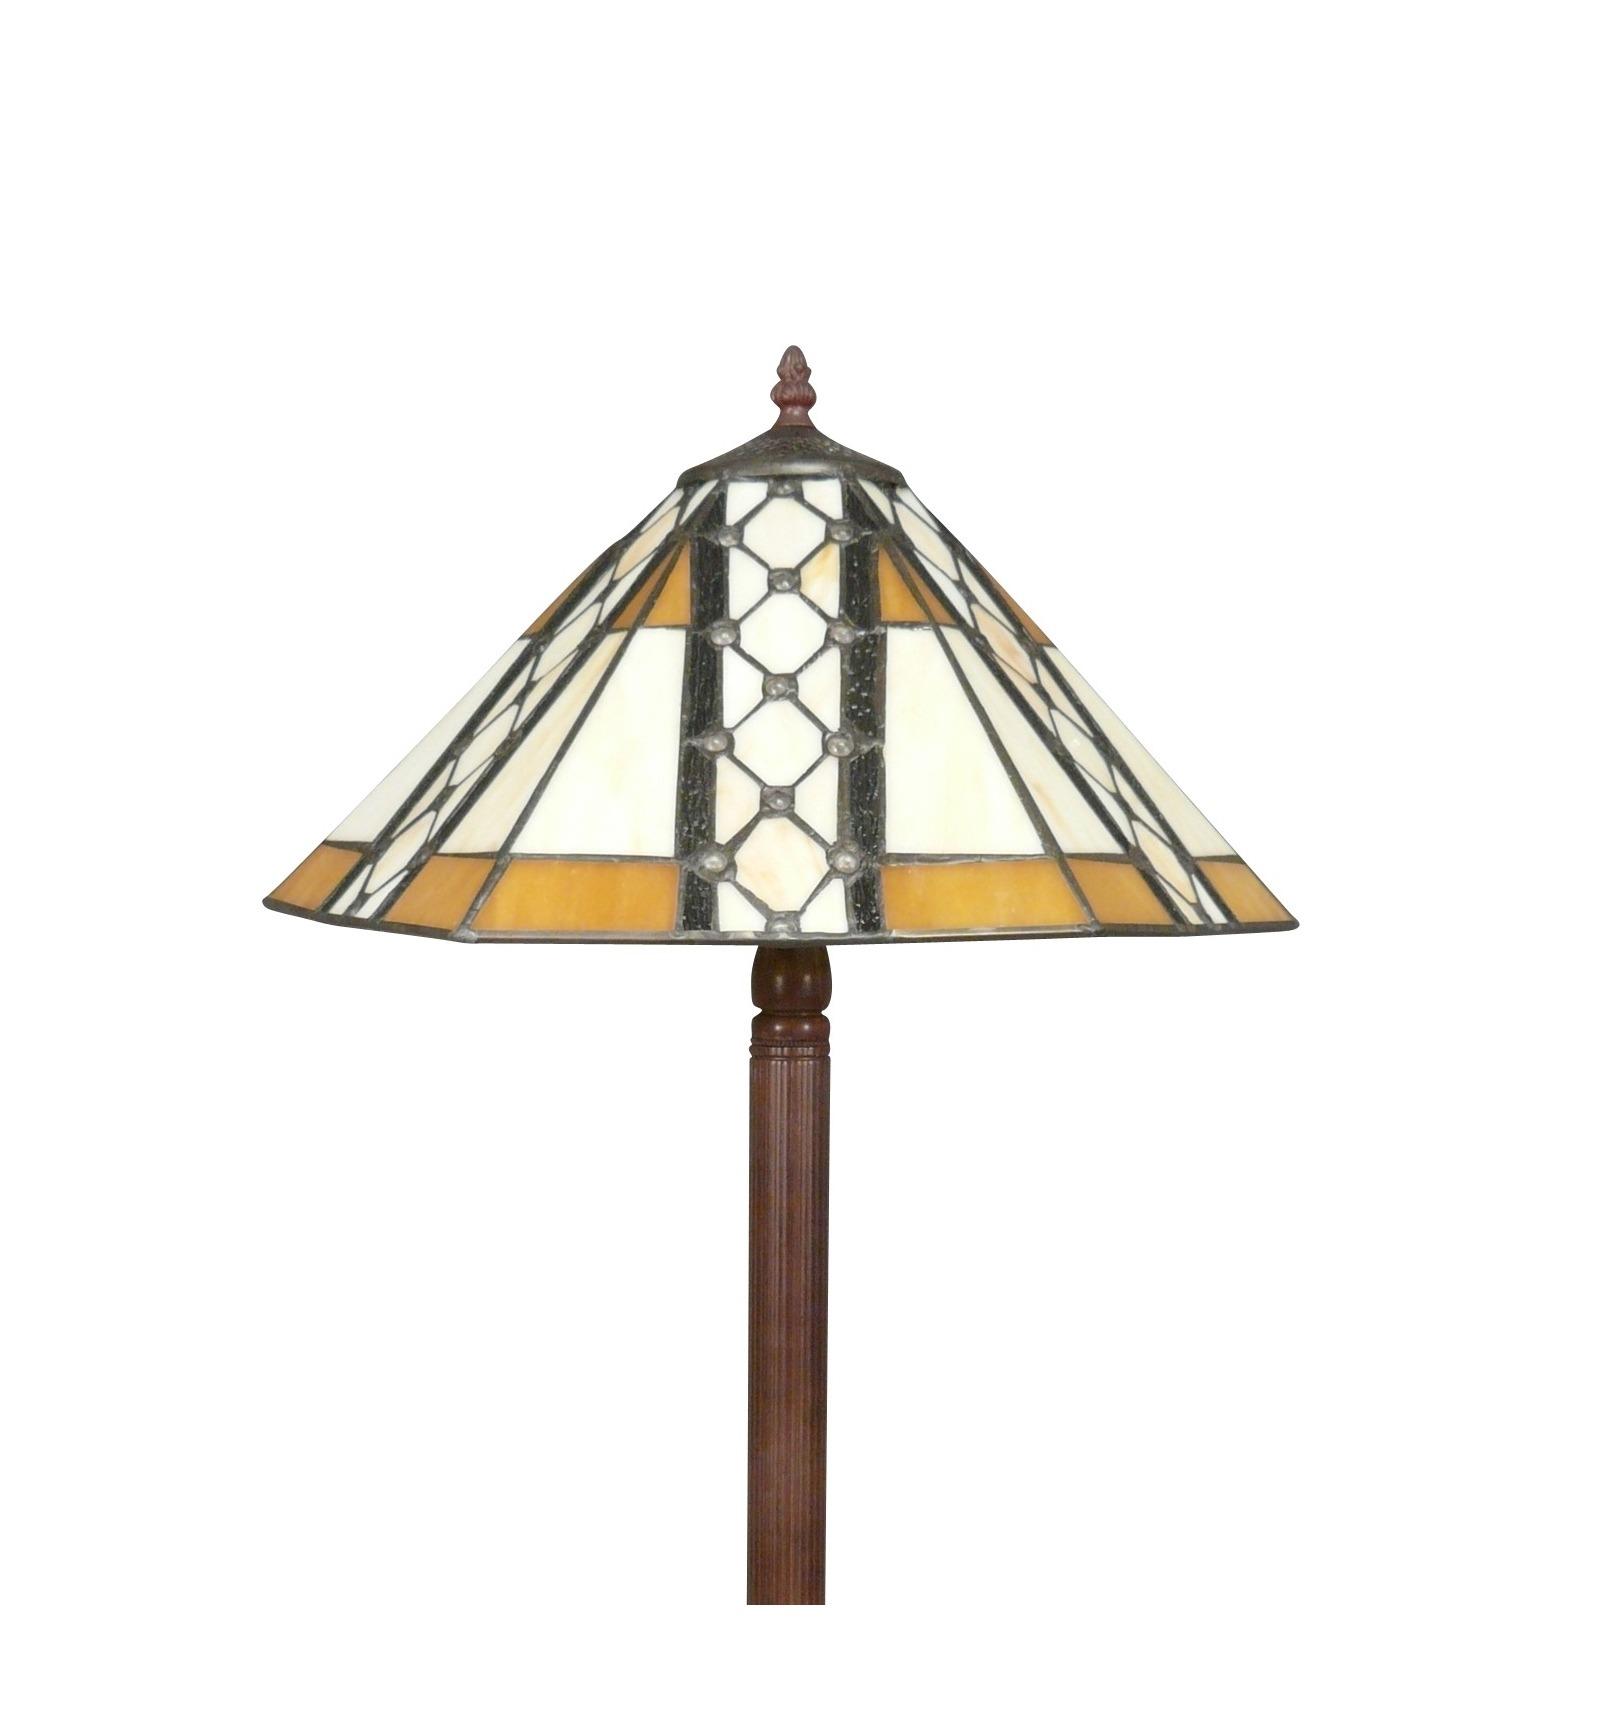 floor lamp tiffany navajo lamps and wall sconces art deco. Black Bedroom Furniture Sets. Home Design Ideas